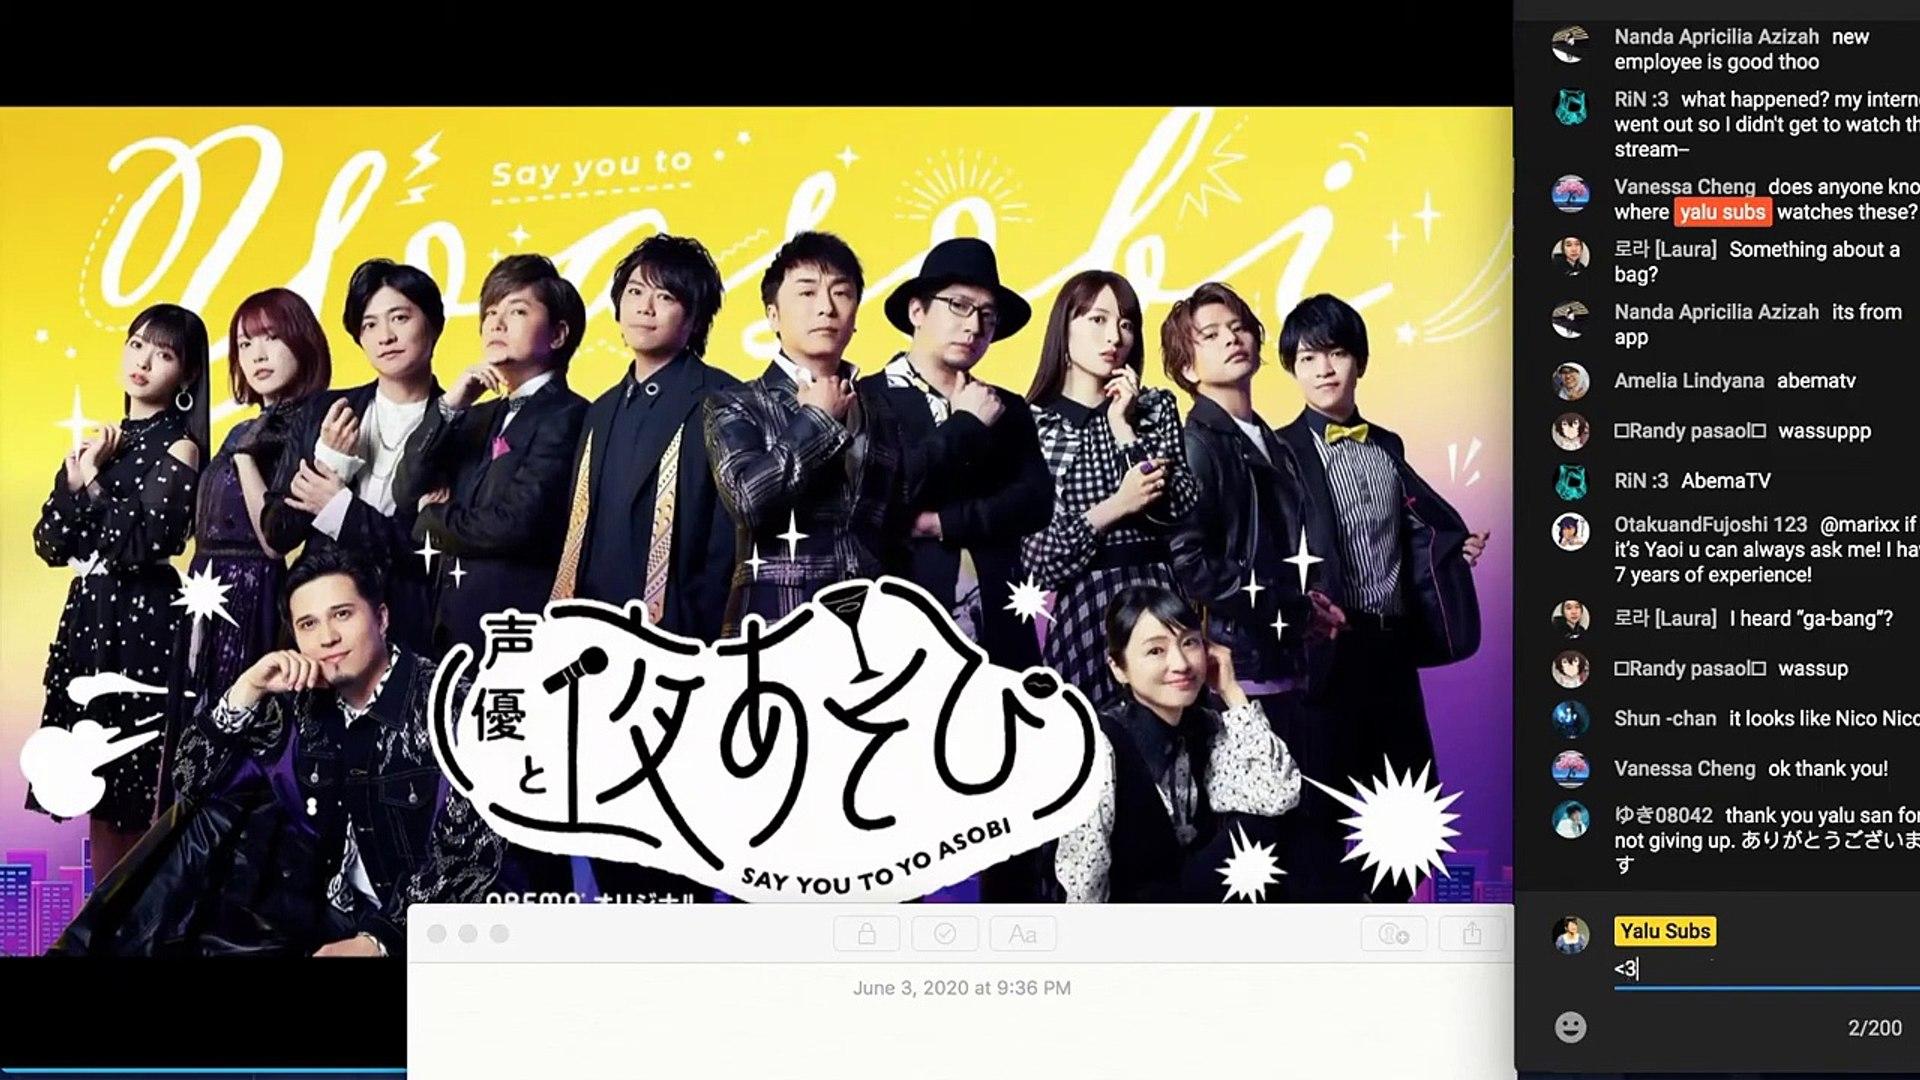 [Shimono Hiro x Uchida Maaya] Yoasobi ep 4 live translate part 2 (dummy head)